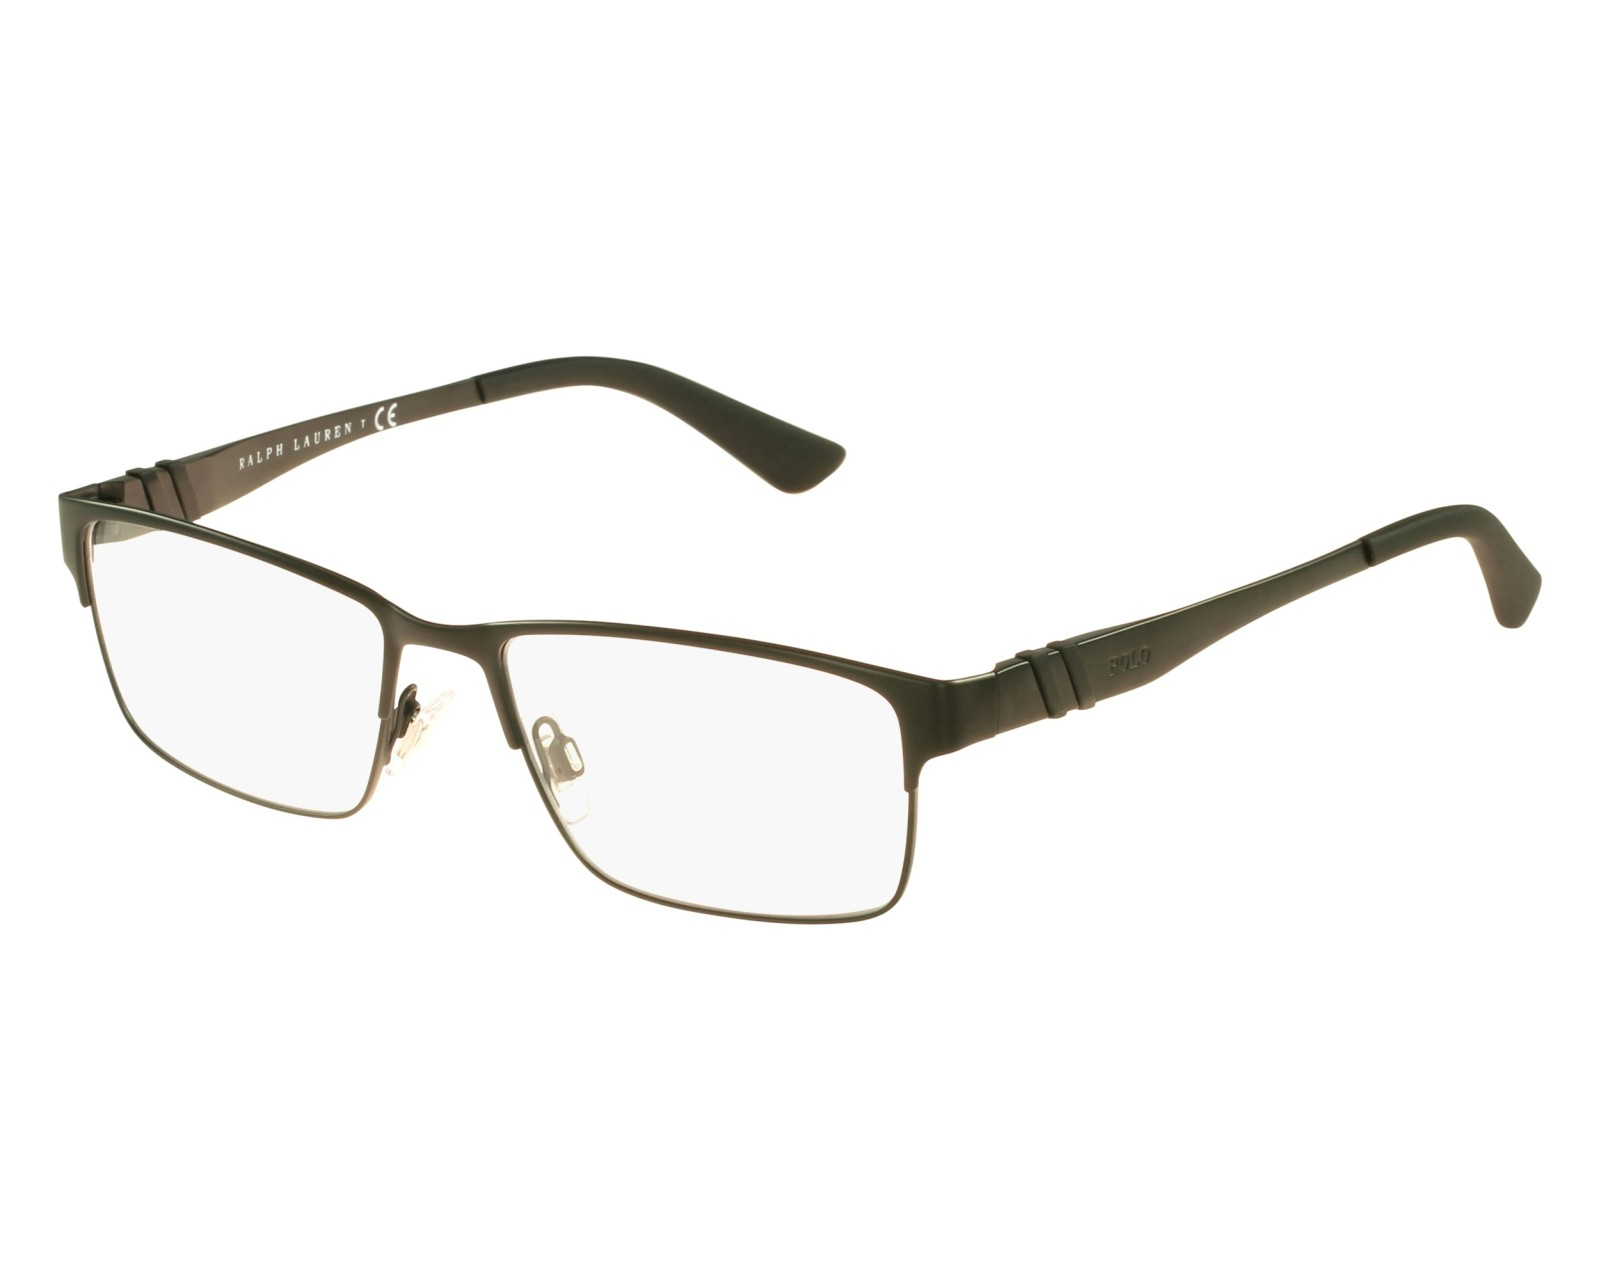 e9450637ed9d eyeglasses Polo Ralph Lauren PH-1147 9038 - Black front view